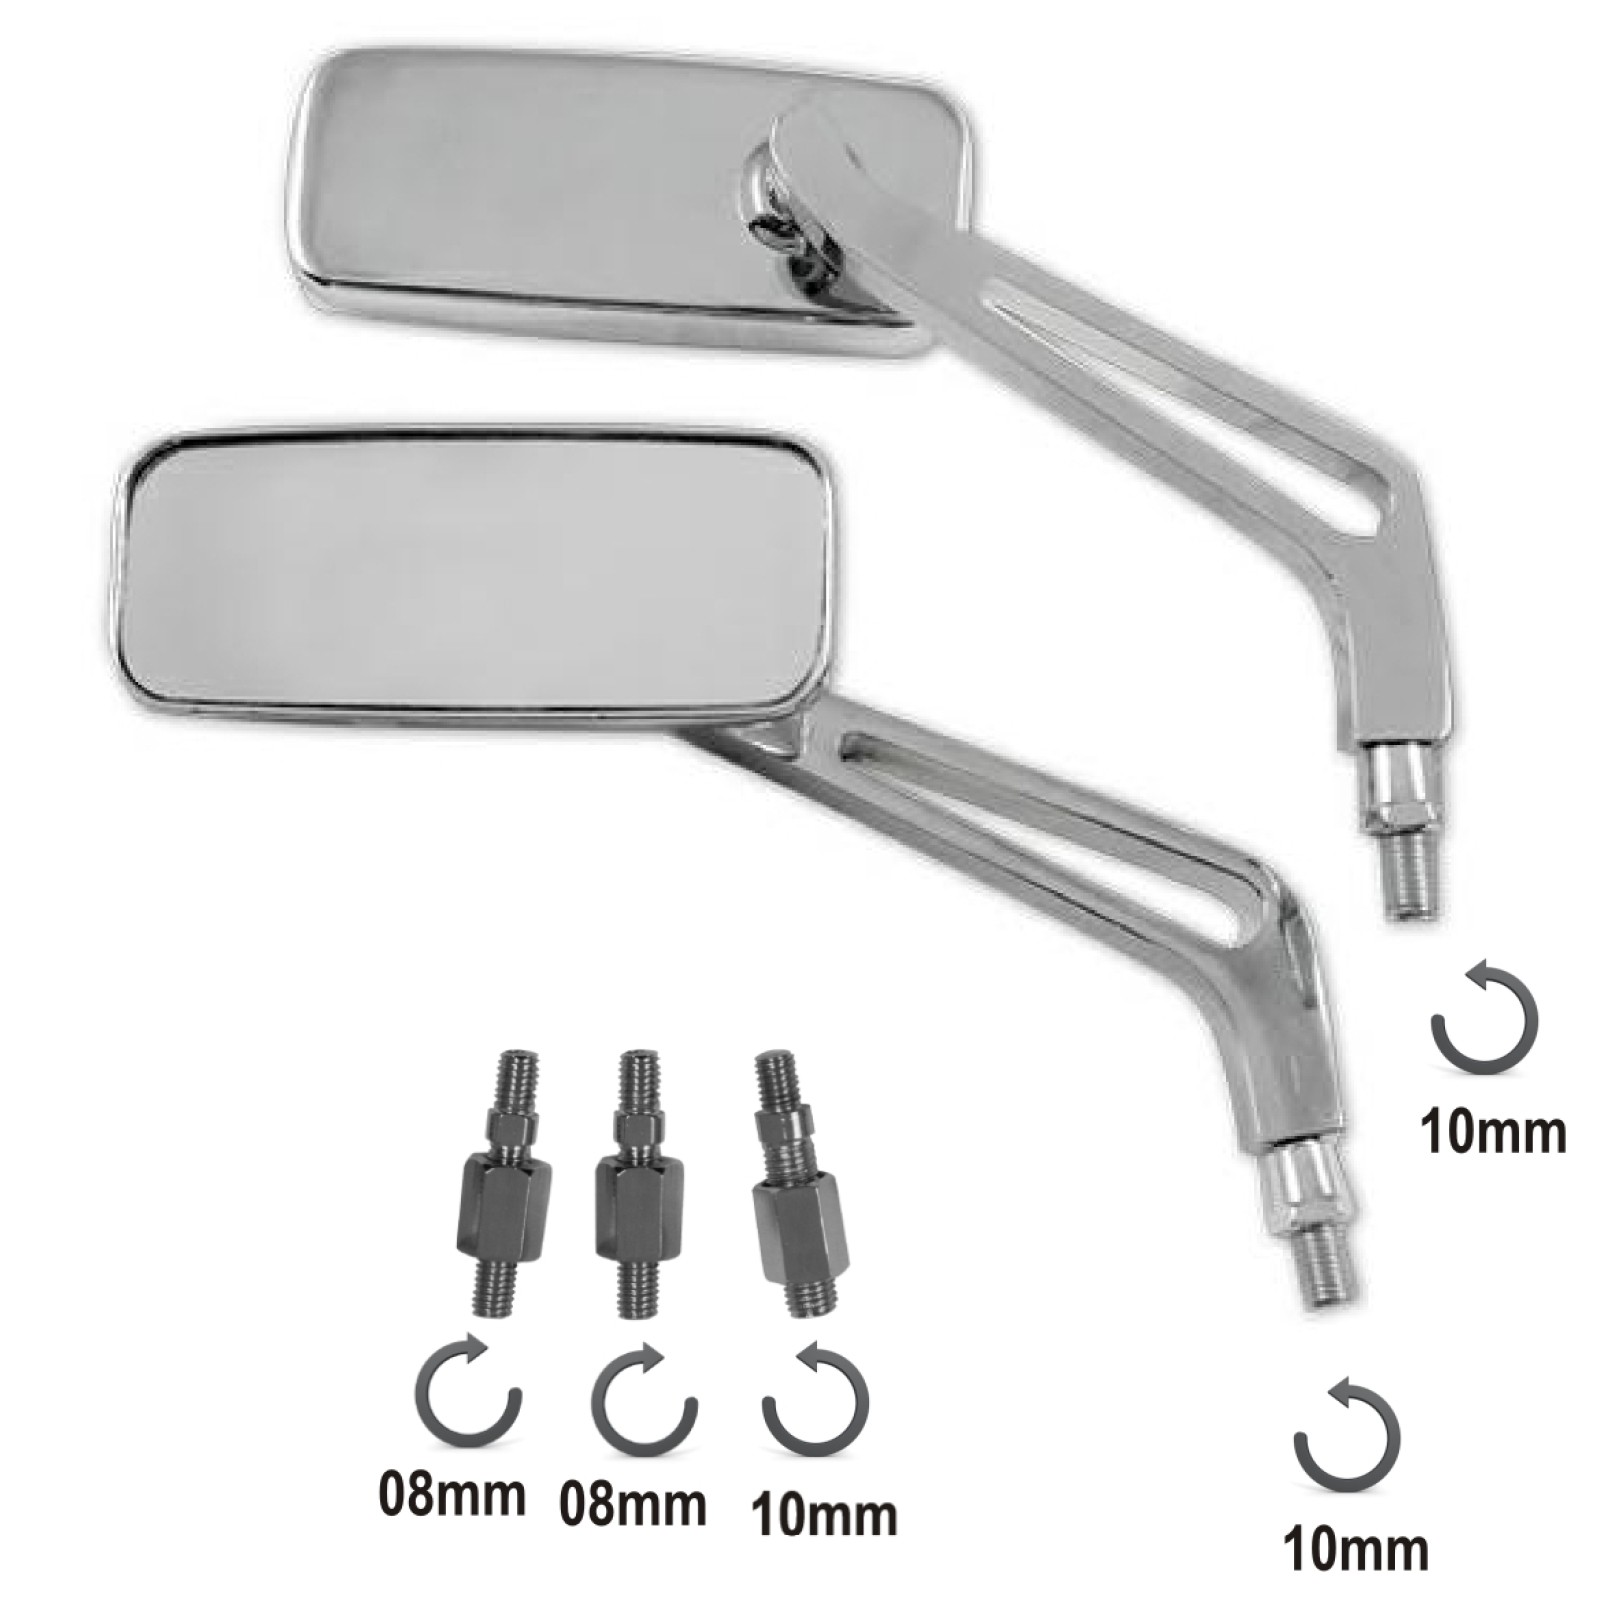 SR-4012-a-pro-specchio-cromo-mirrors-chrome-metallo-metal-sonic-moto